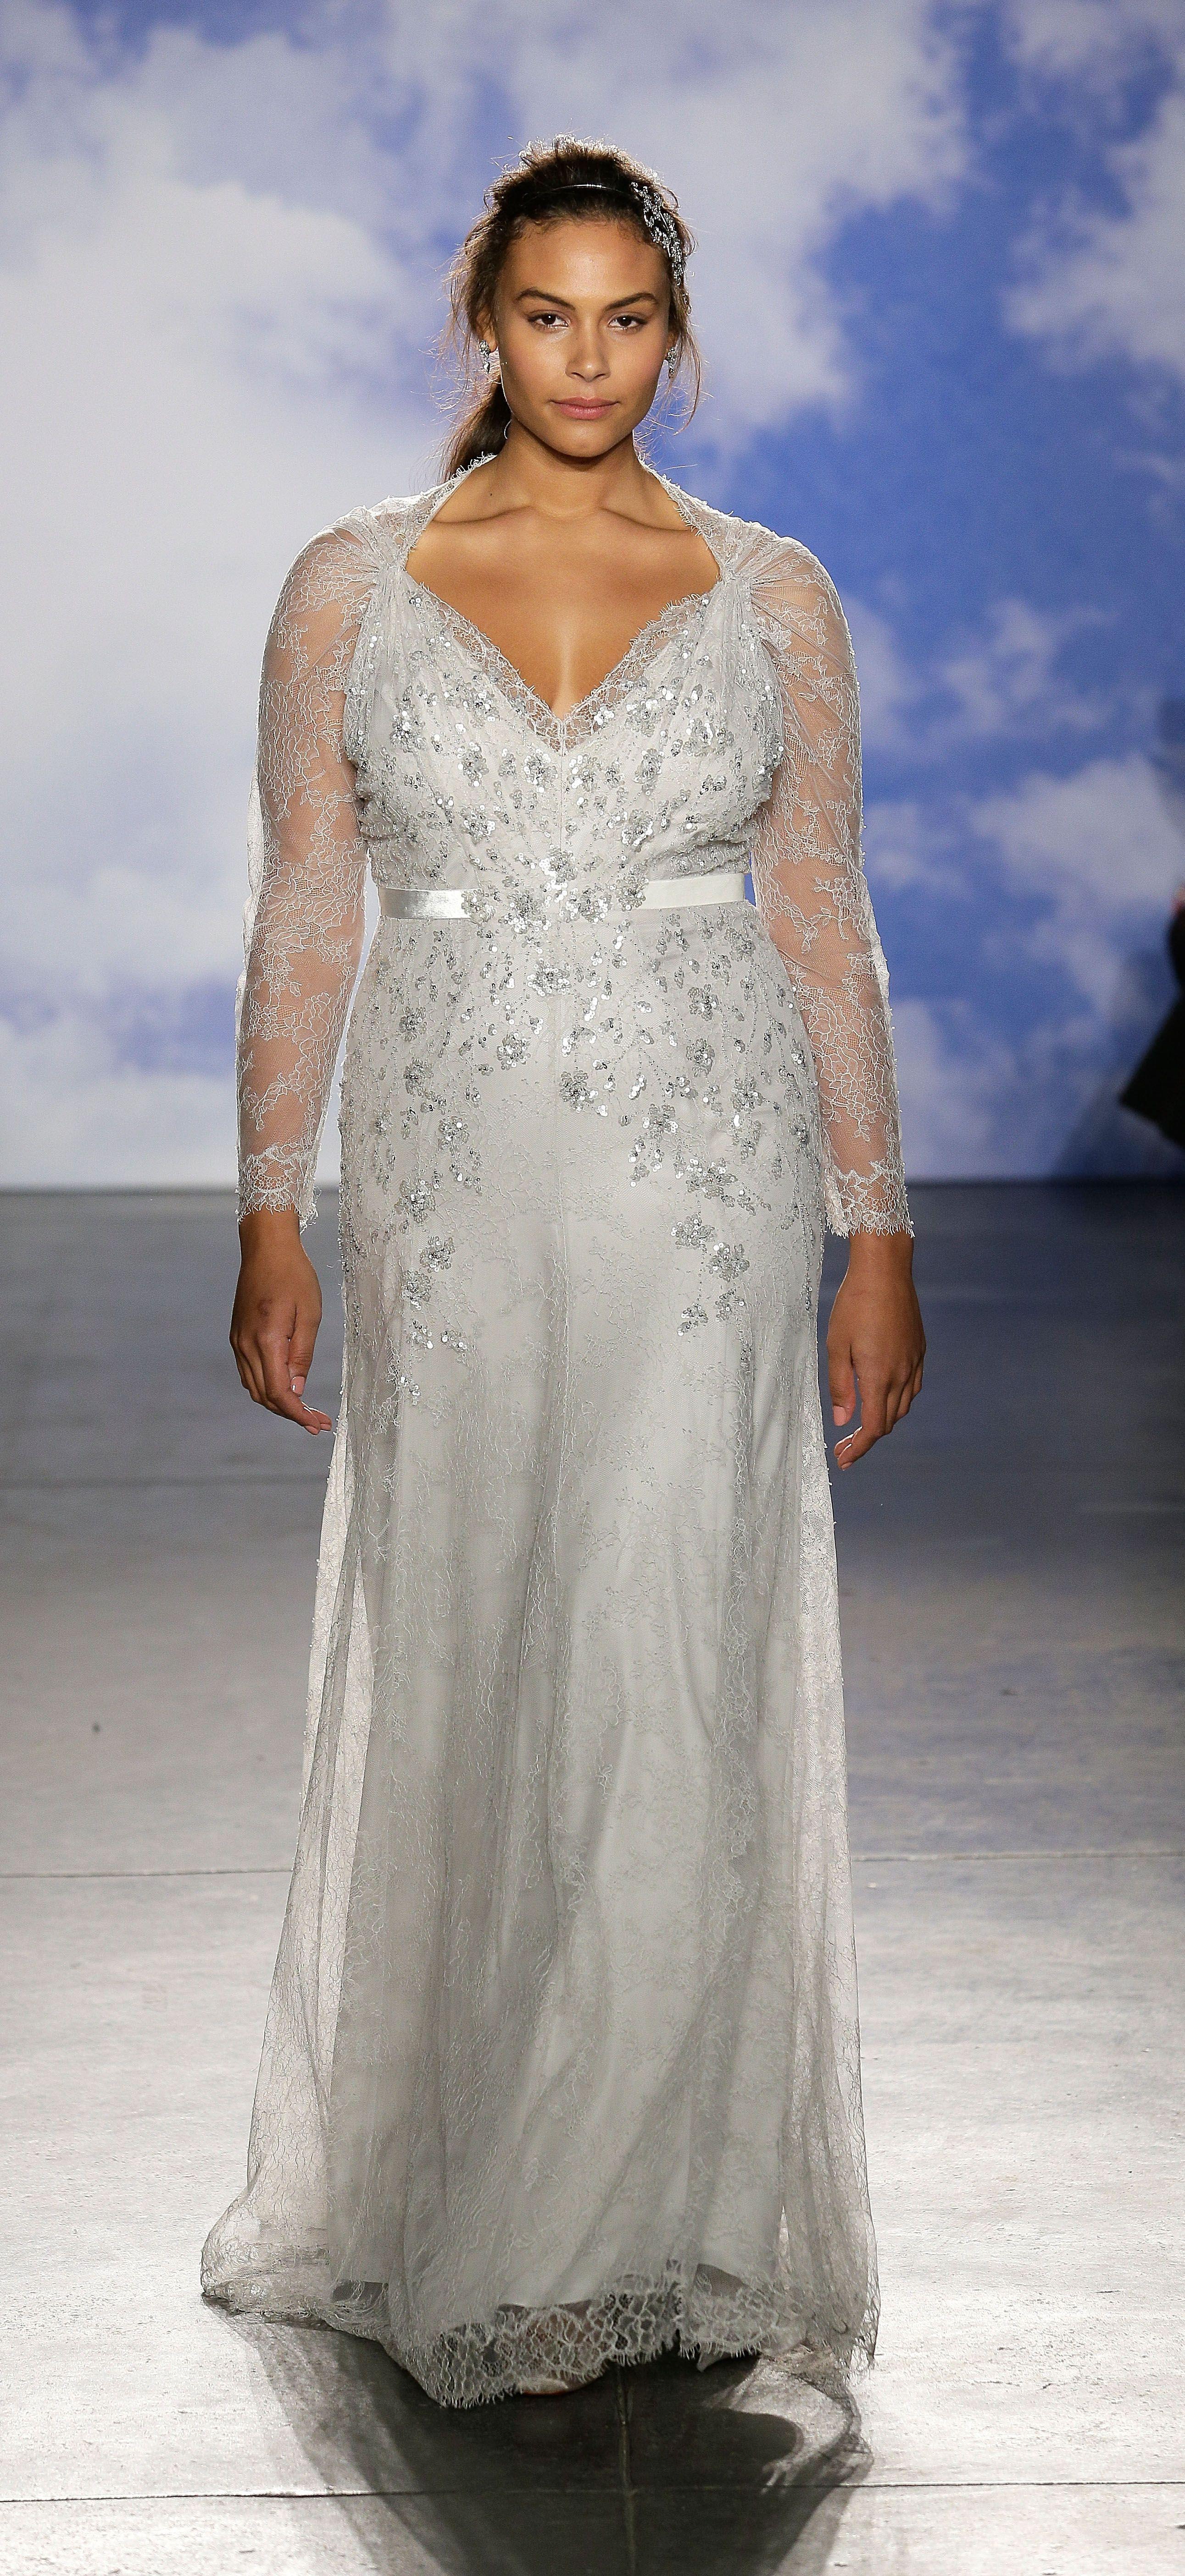 Jenny Packham Gives Plus-Size Brides Some Gorgeous Options ...